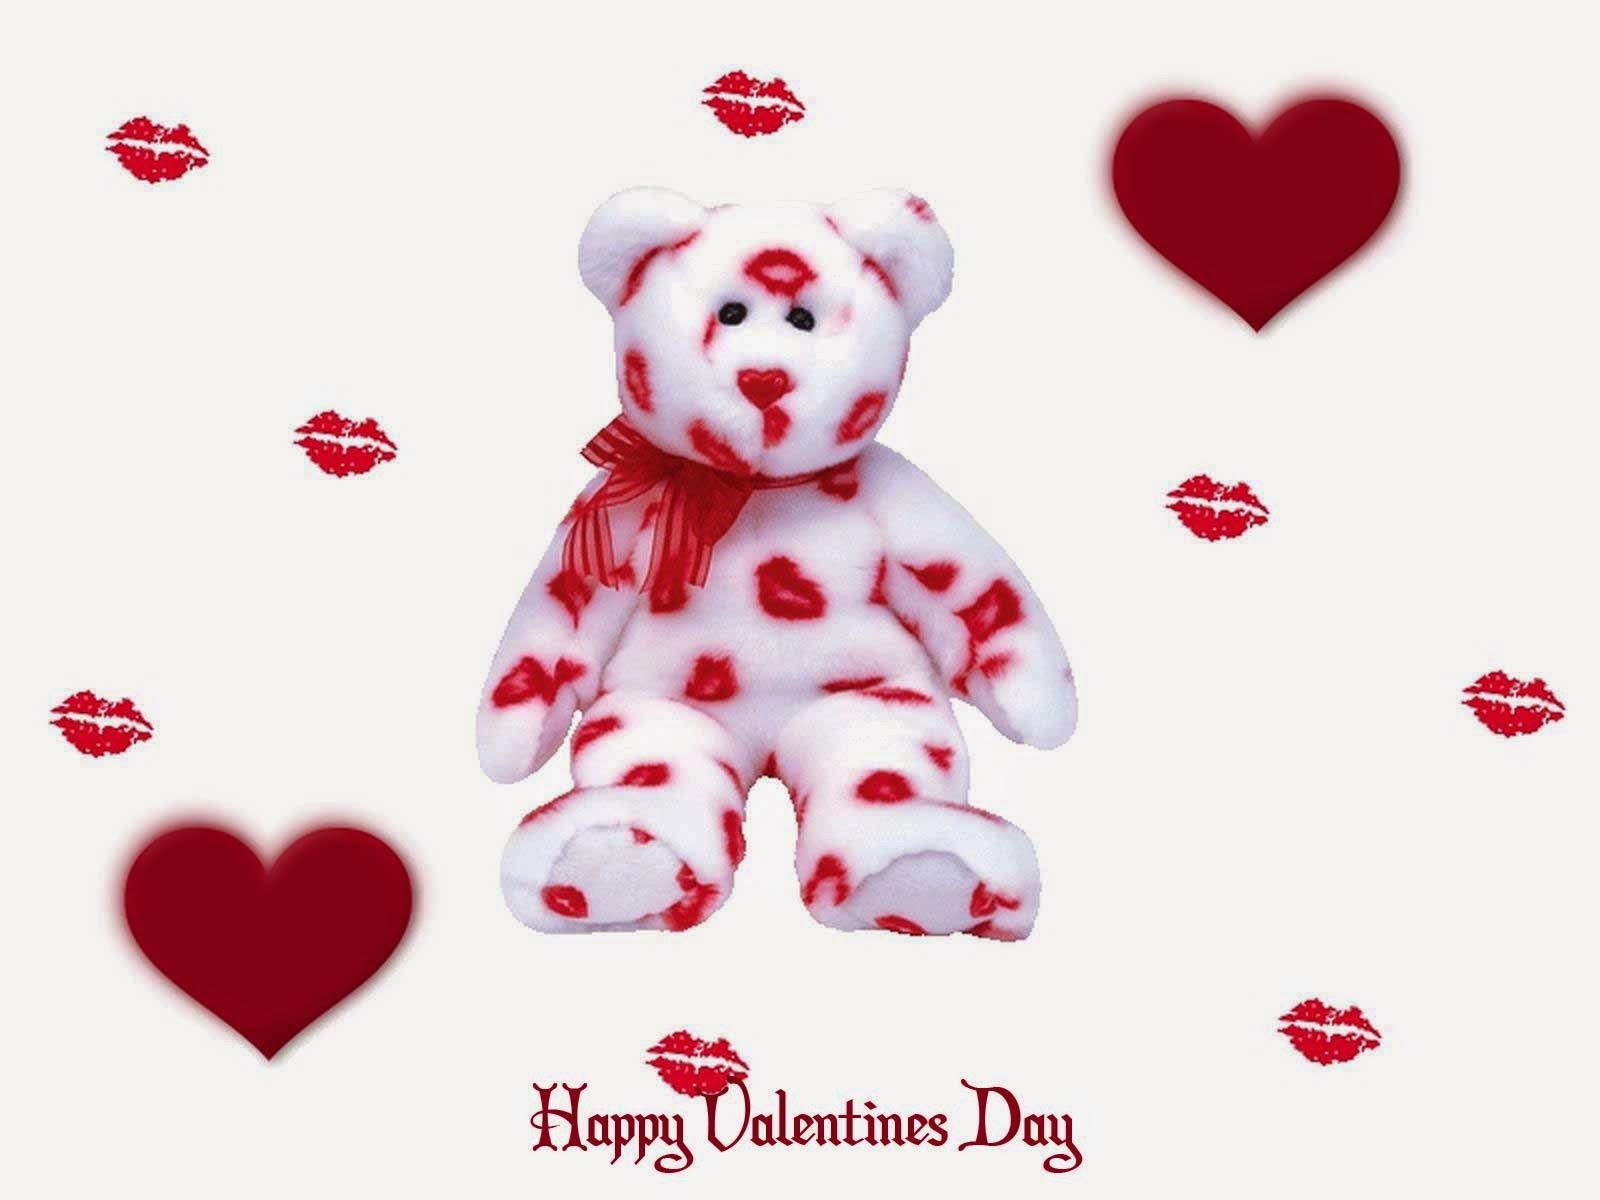 Free Valentine Cards – Free Valentine Cards for Facebook